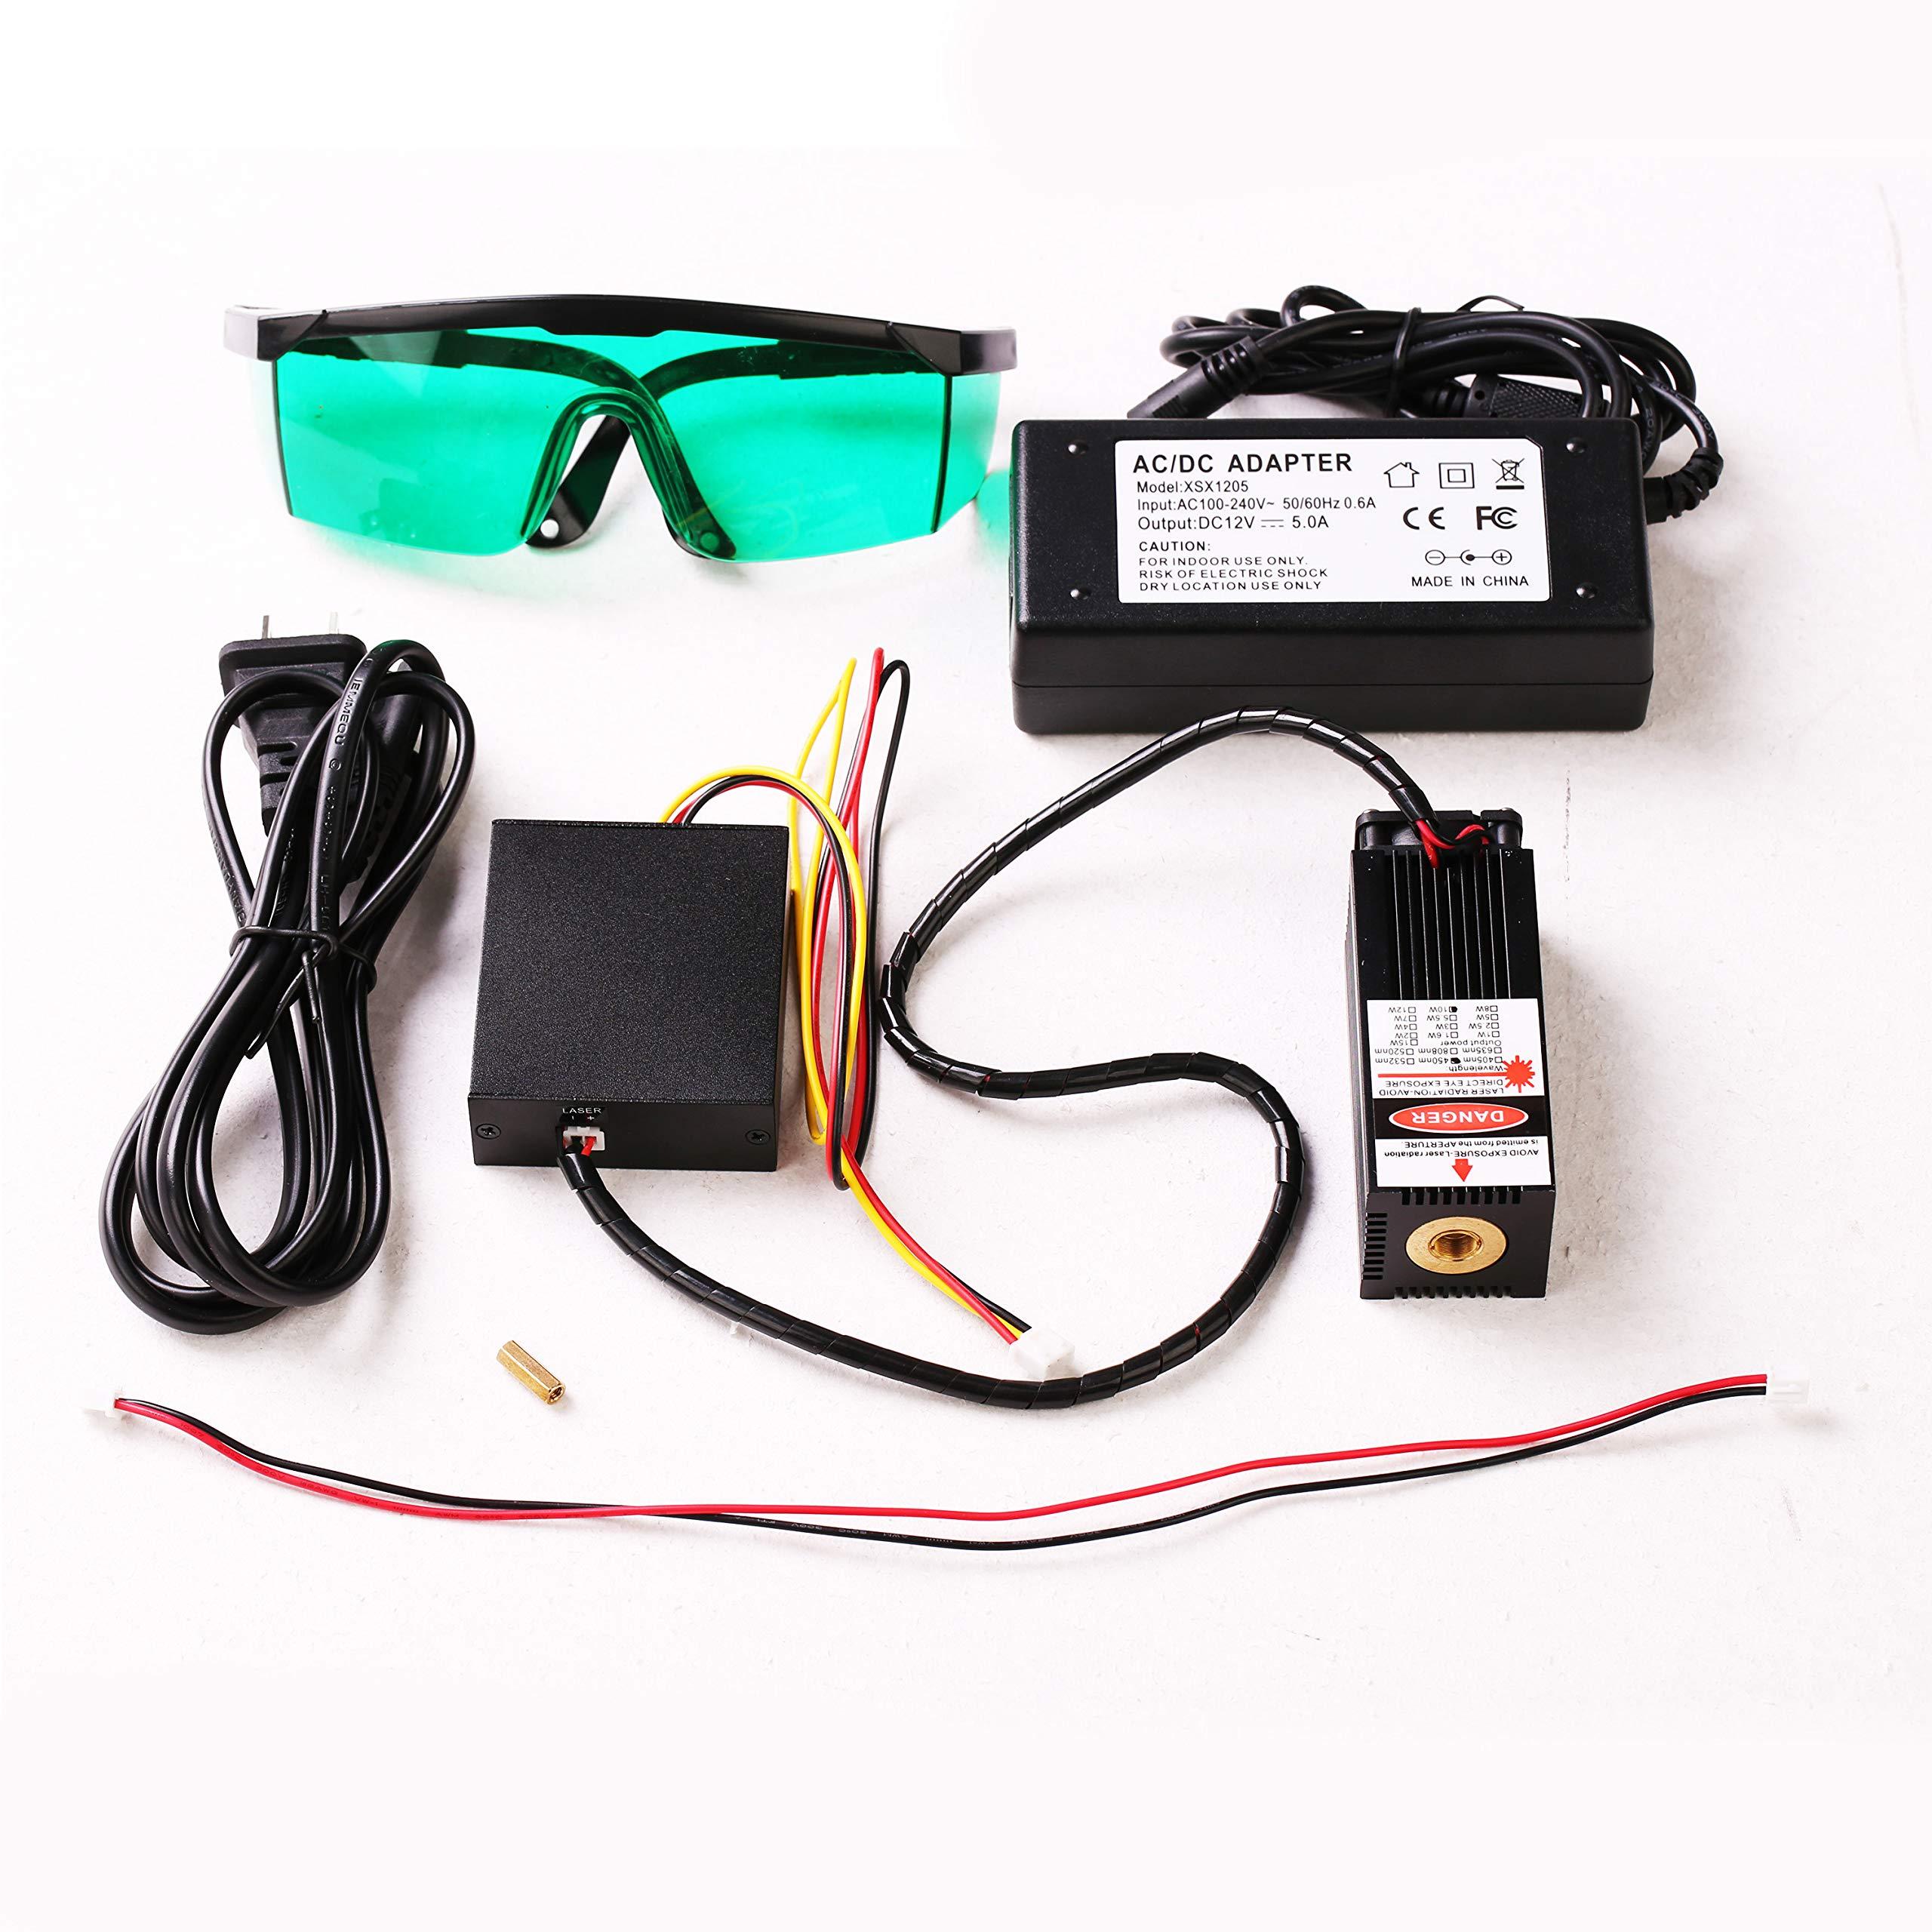 Blue Laser Module 405nm/450nm 500mW/2.5W/5.5W/10W/15W Focusable for 3D Printer/CNC Engraving/Laser Engraving ...(10W-V2)